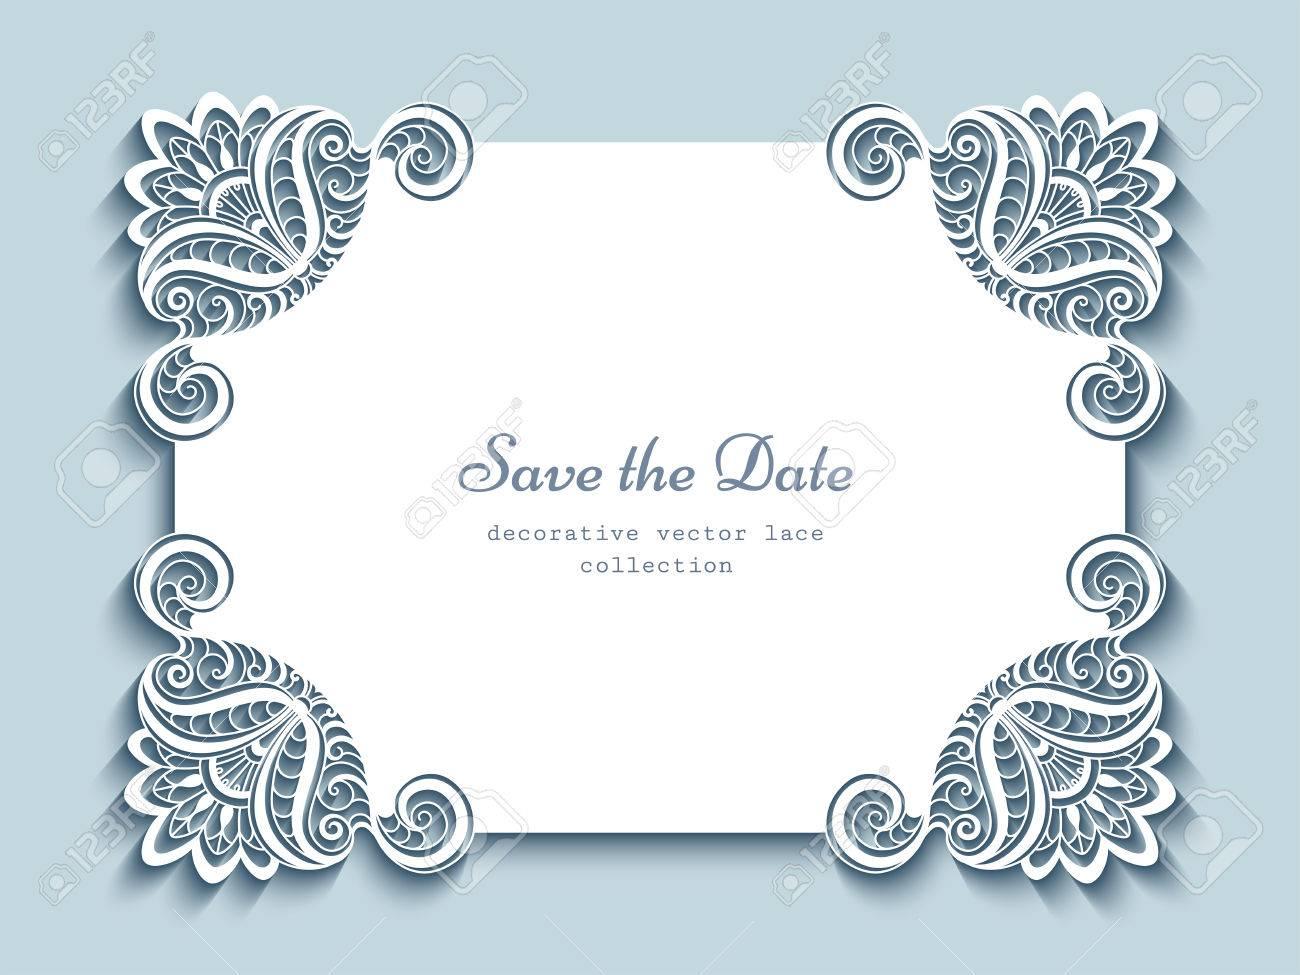 Cutout paper frame elegant greeting card or wedding invitation cutout paper frame elegant greeting card or wedding invitation template with lace corners stock vector stopboris Images